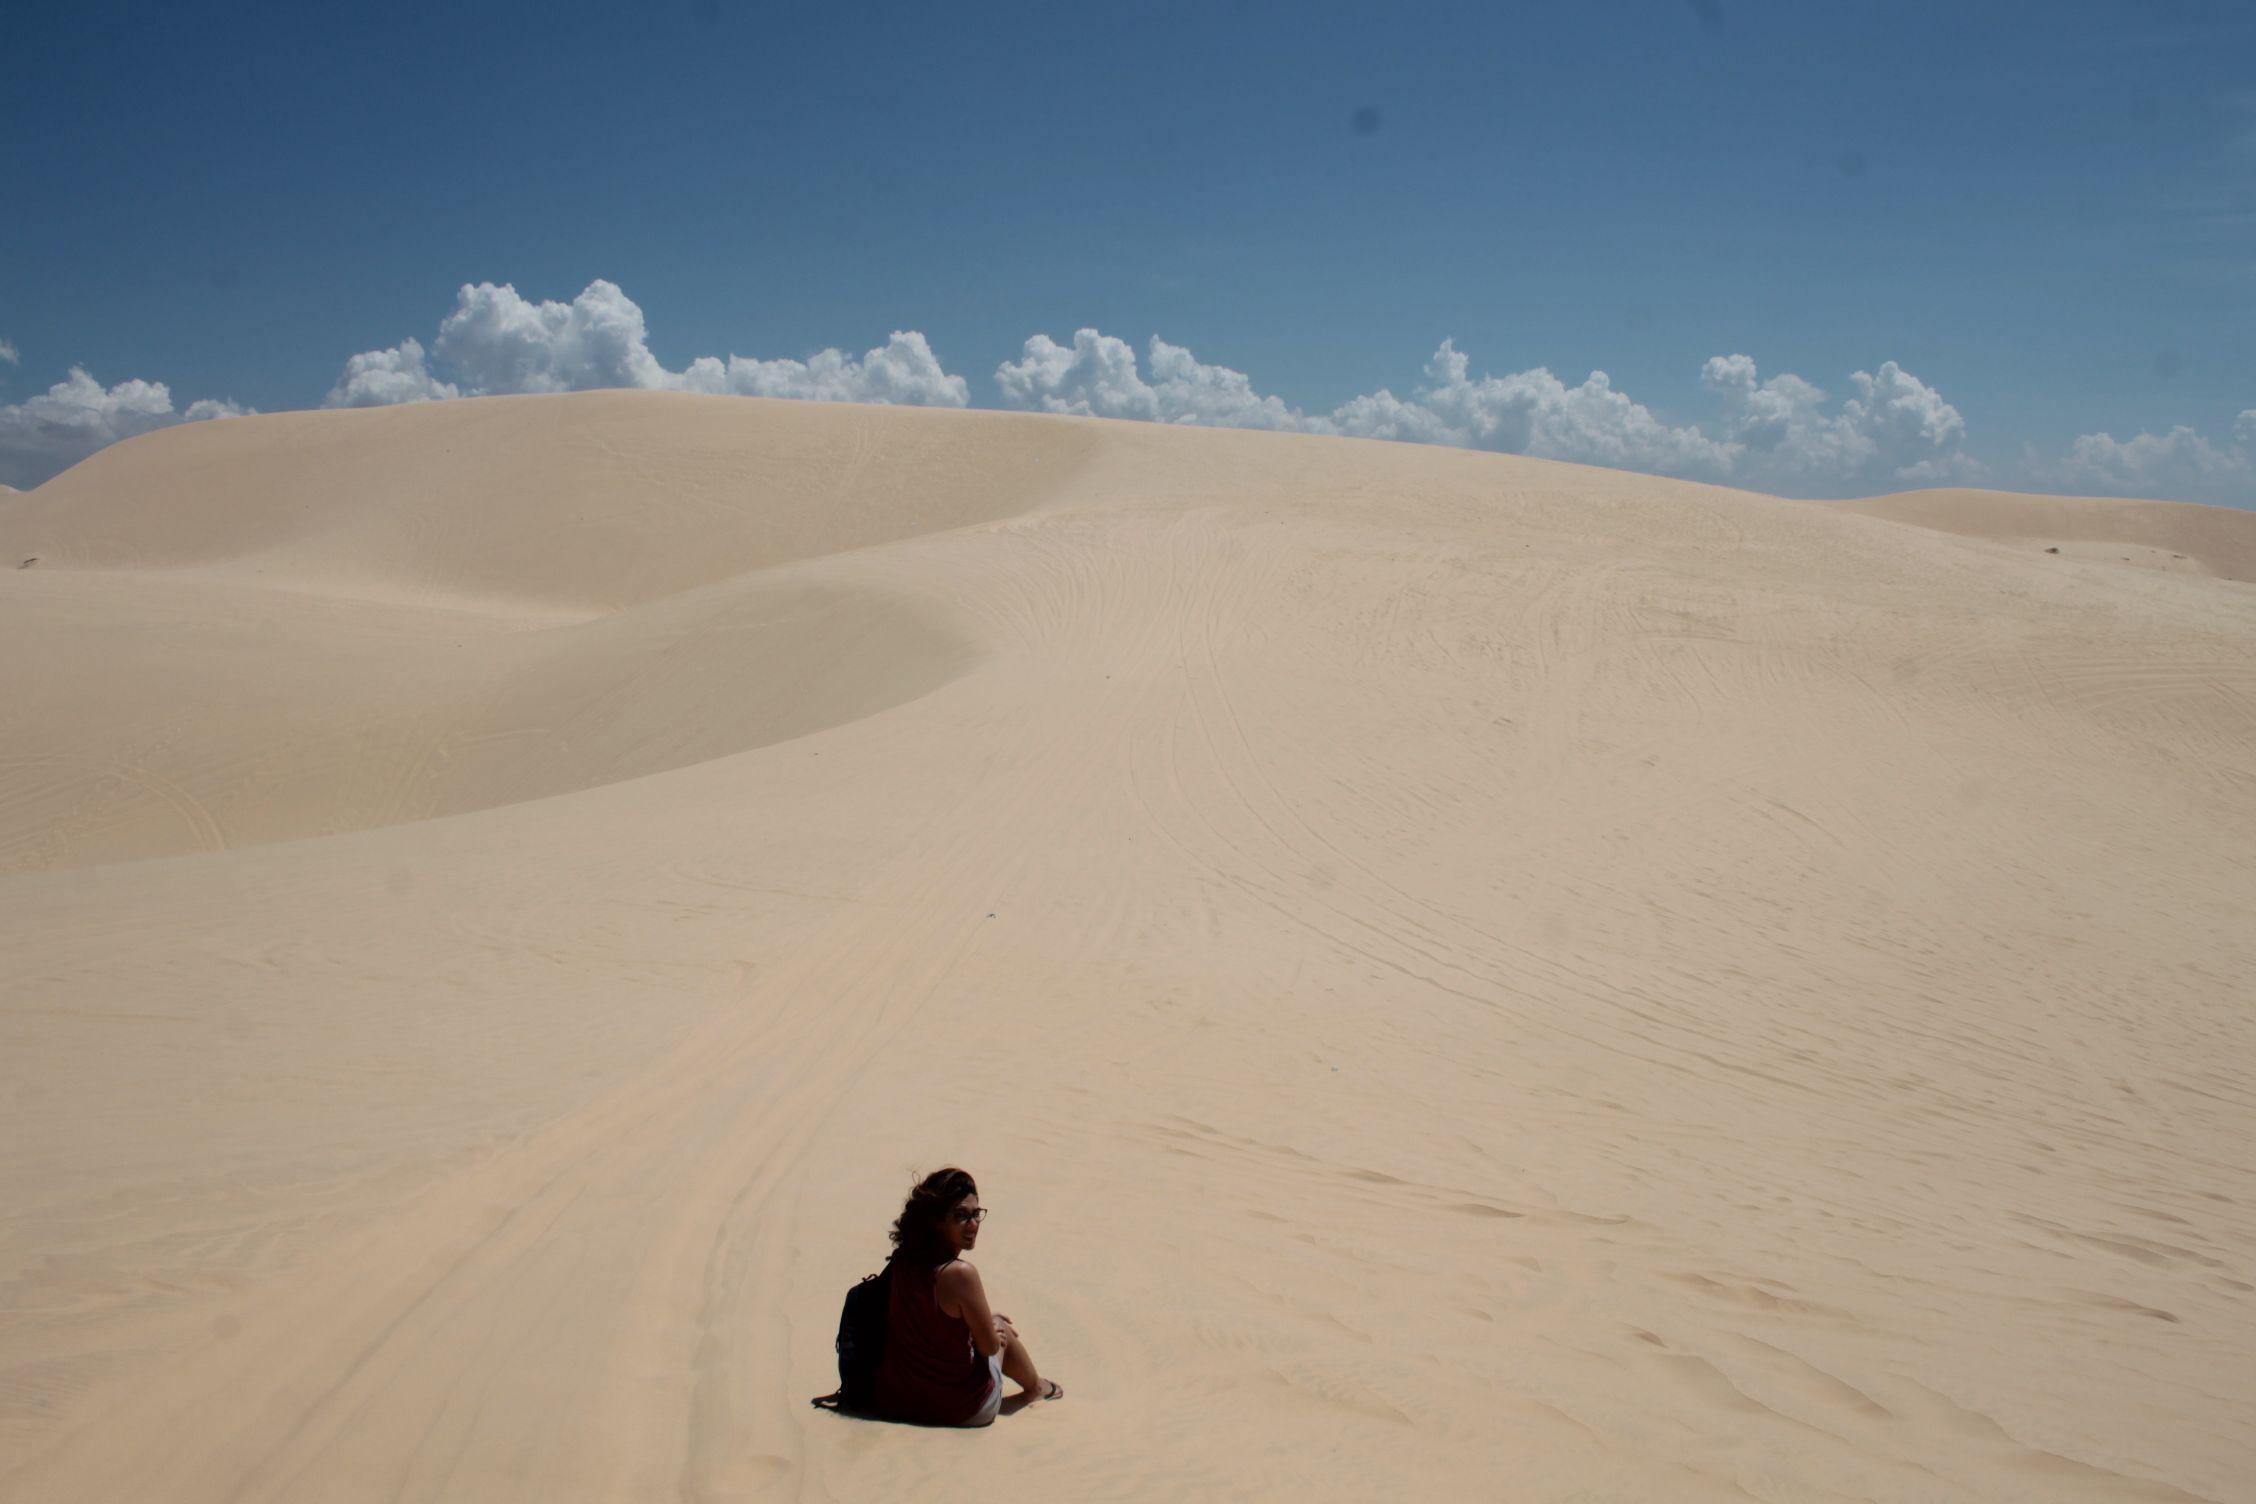 Roser sentada en las dunas blancas de Mui Ne